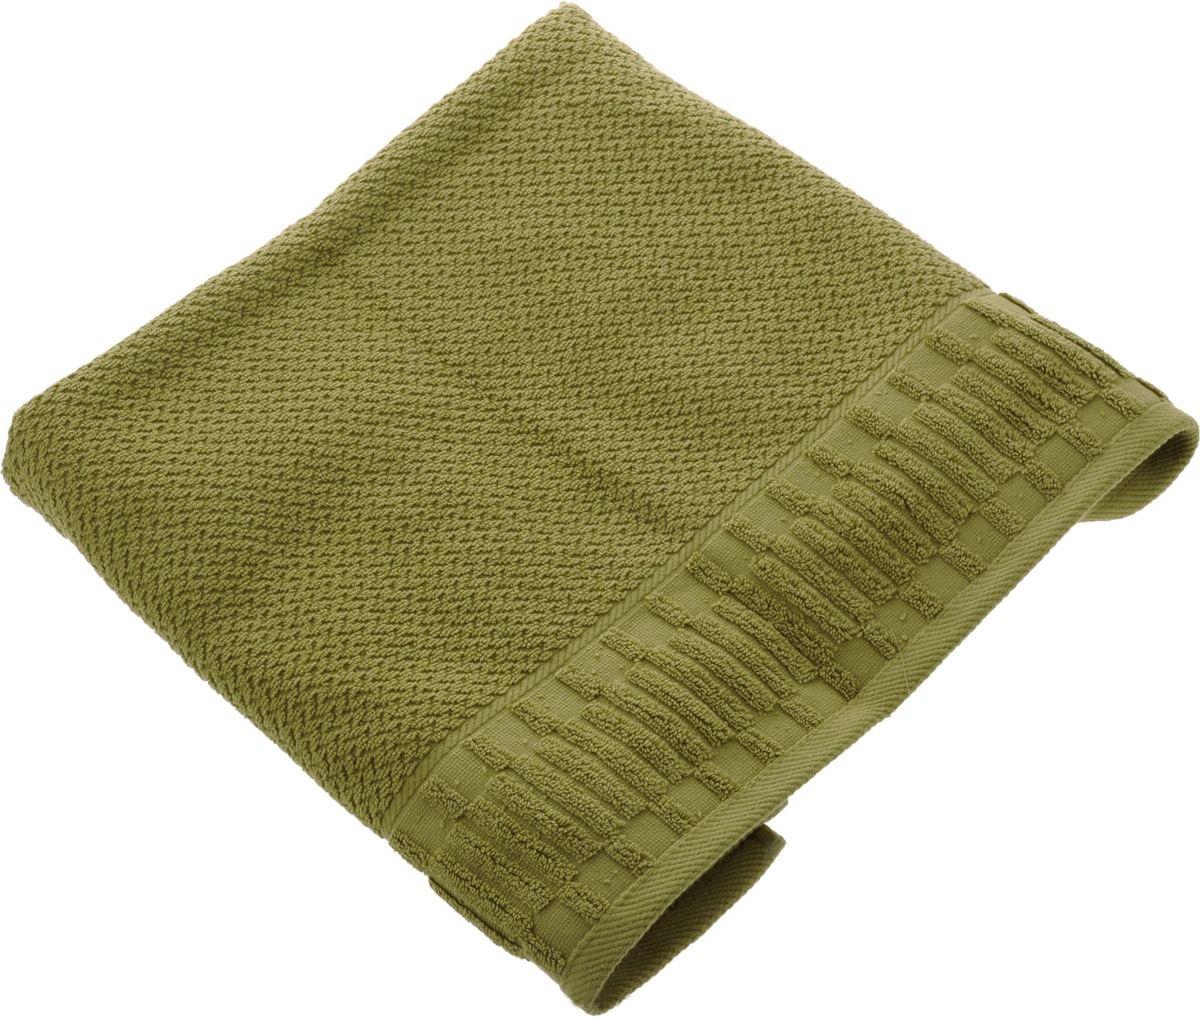 Полотенца Soavita Полотенце Mineola Цвет: Зеленый (50х90 см) полотенце кухонное soavita цвет коралловый диаметр 65 см 48800